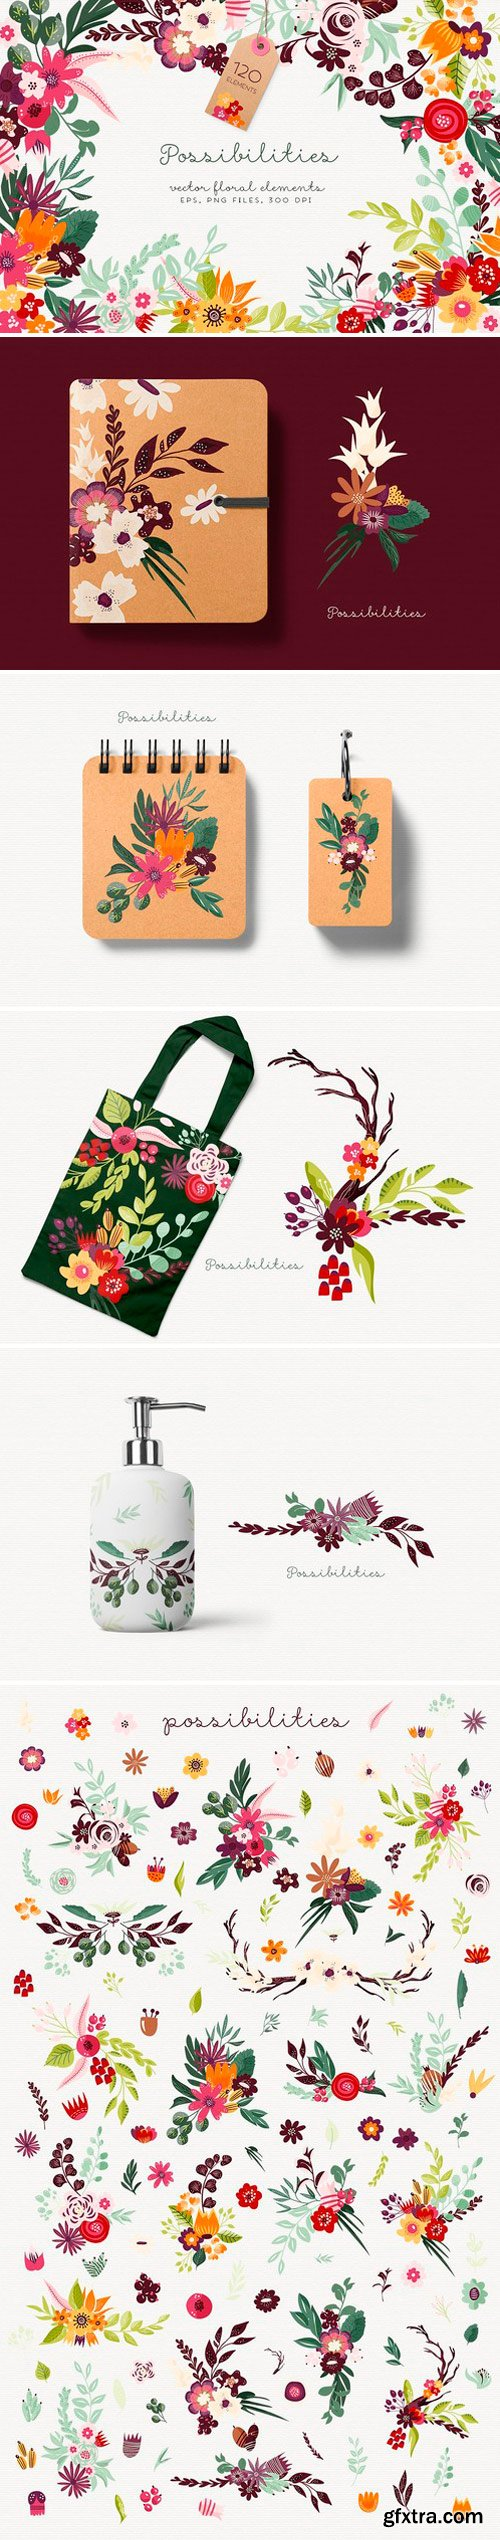 CM - Possibilities - floral elements 1844713